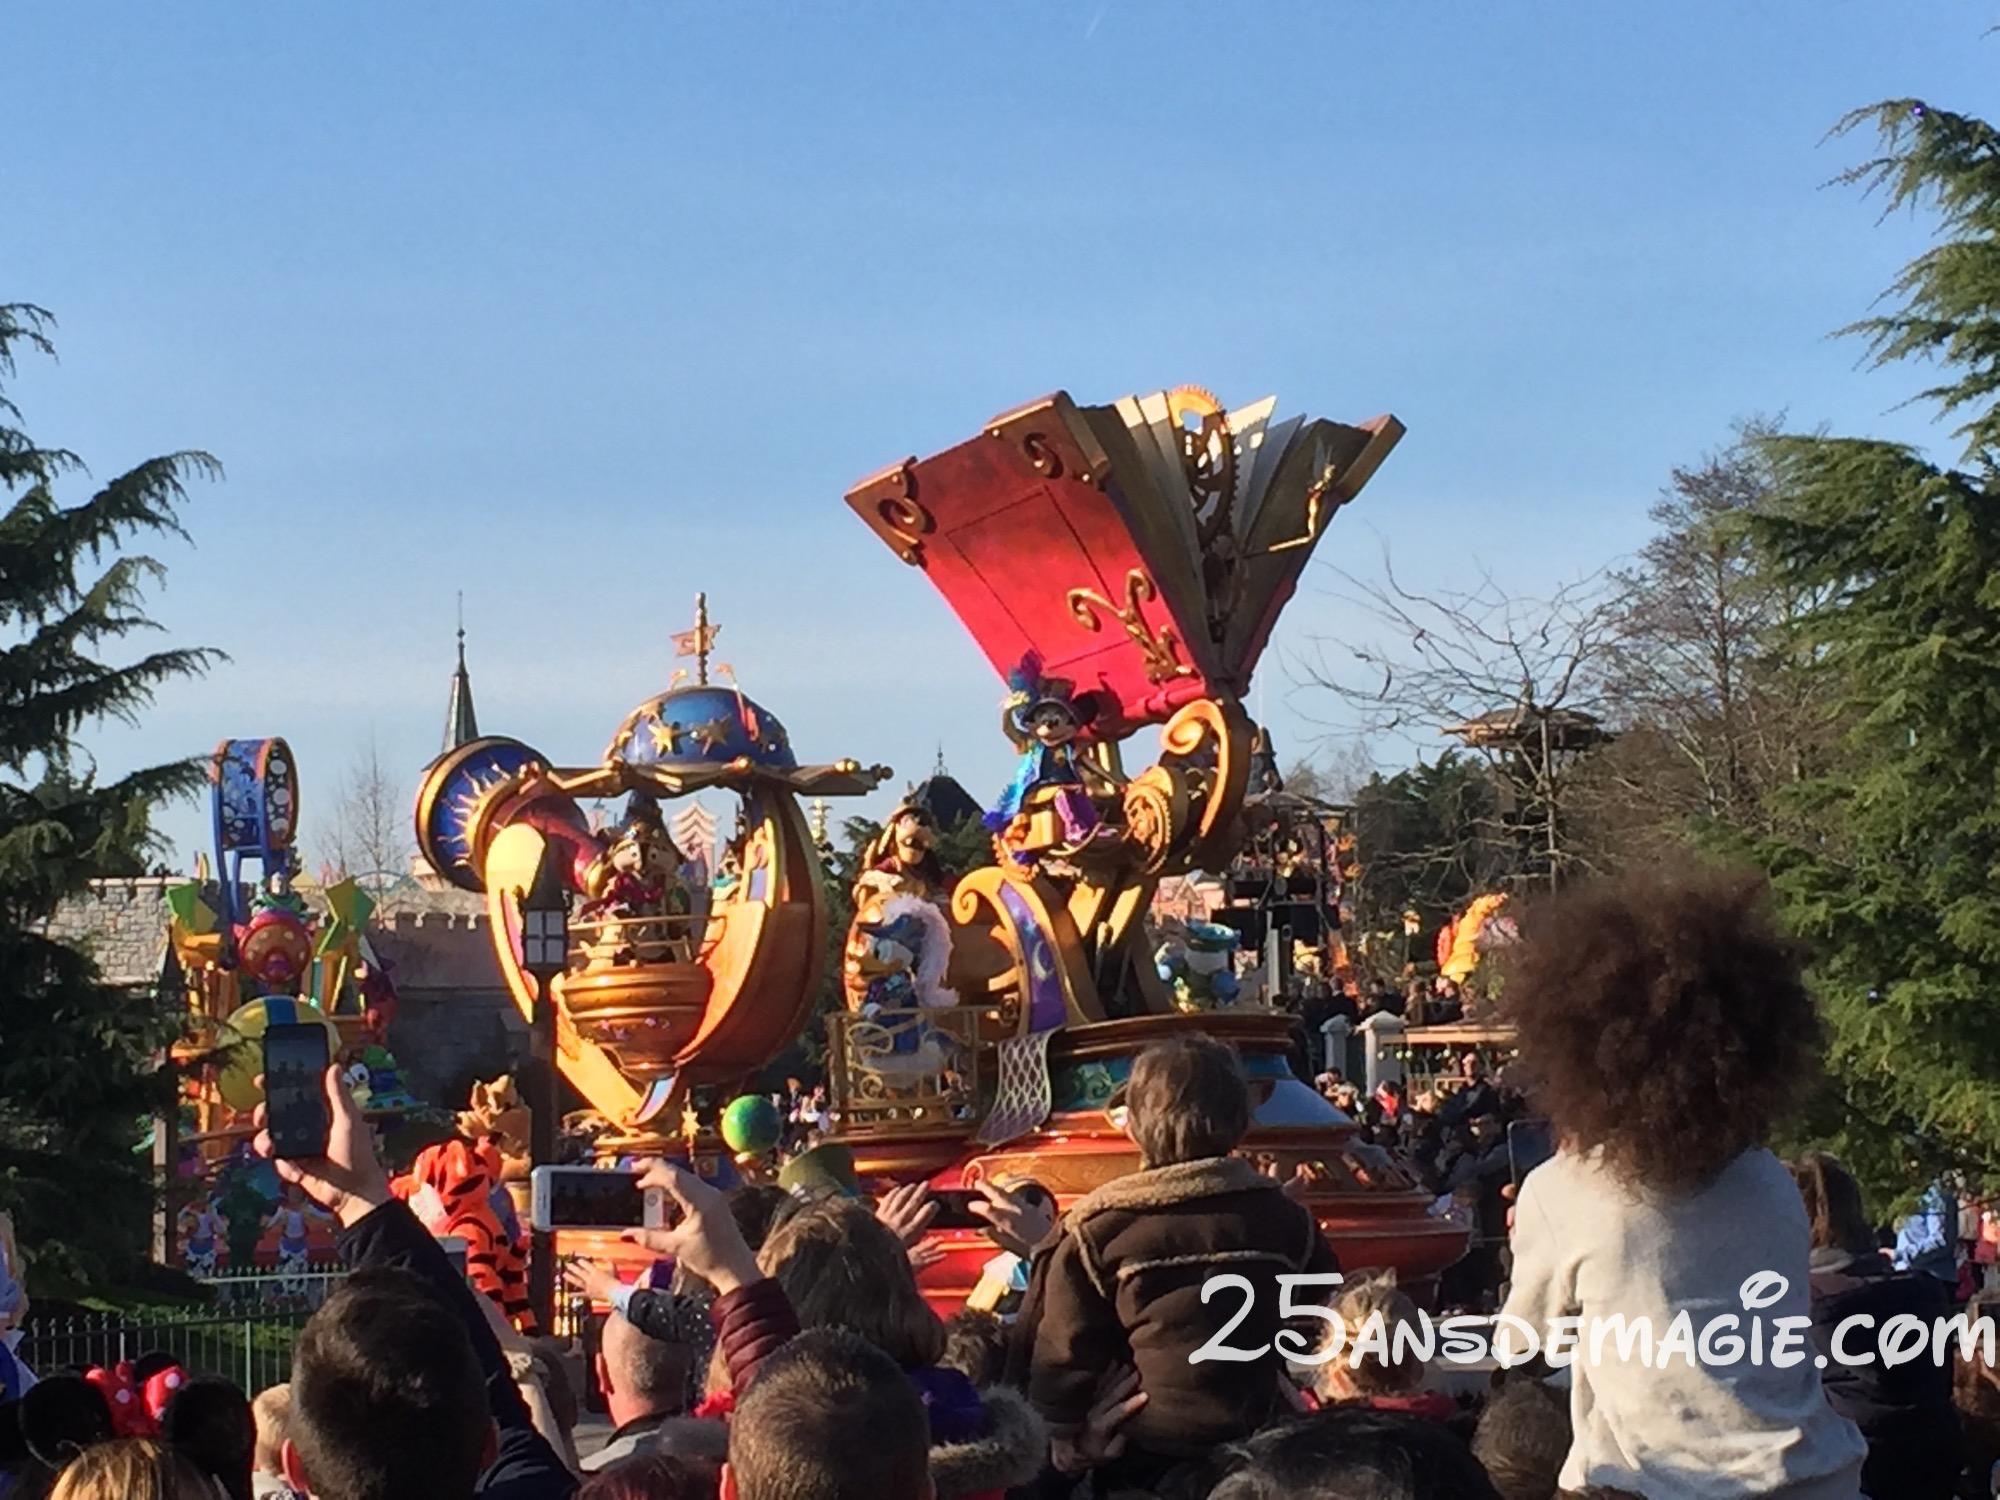 disneylandparis25_disney_stars_on_parade1